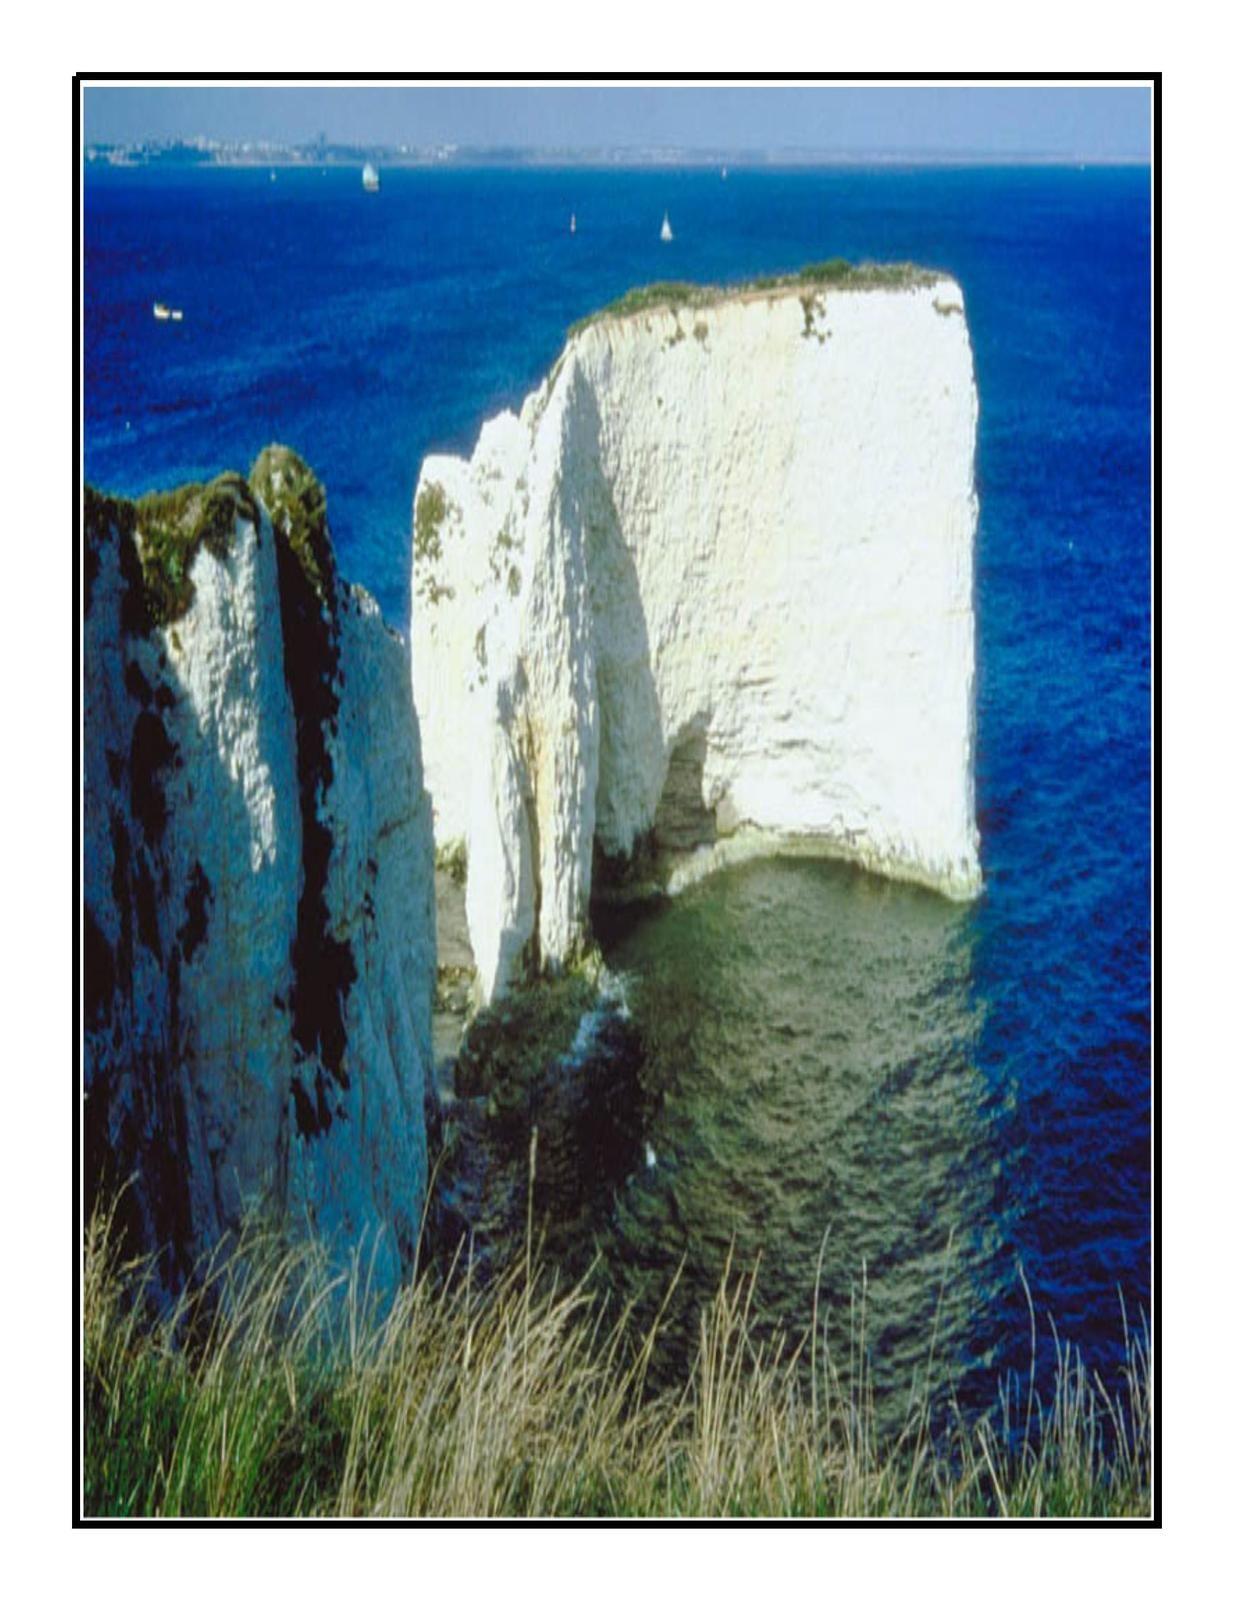 White rock formation in water-Digital Download-ClipArt-ArtClip-Digital